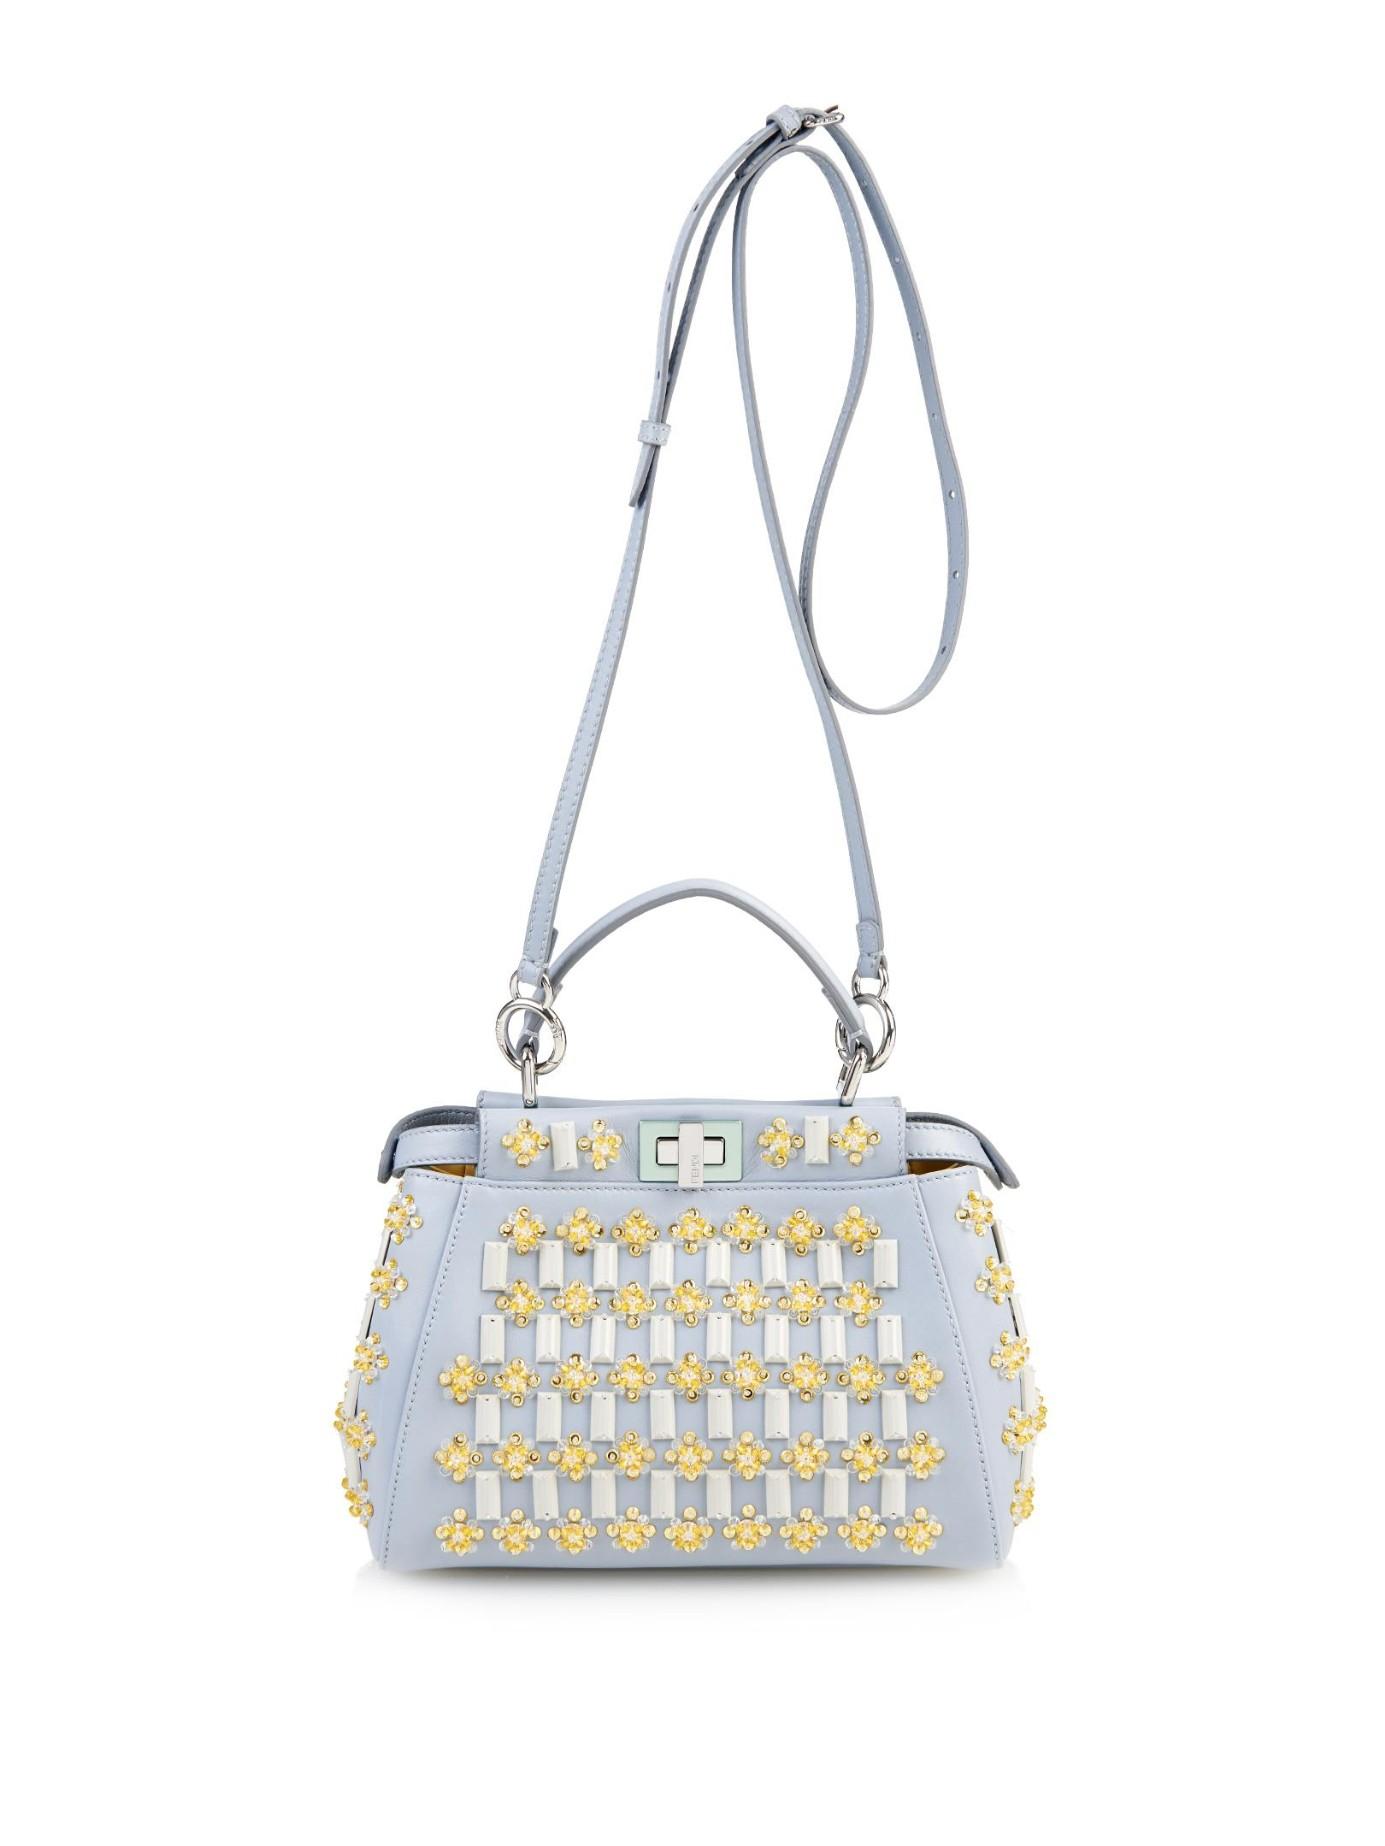 Lyst - Fendi Mini Peekaboo Floral-Embellishments Cross-Body Bag in Blue beb59ffb72711